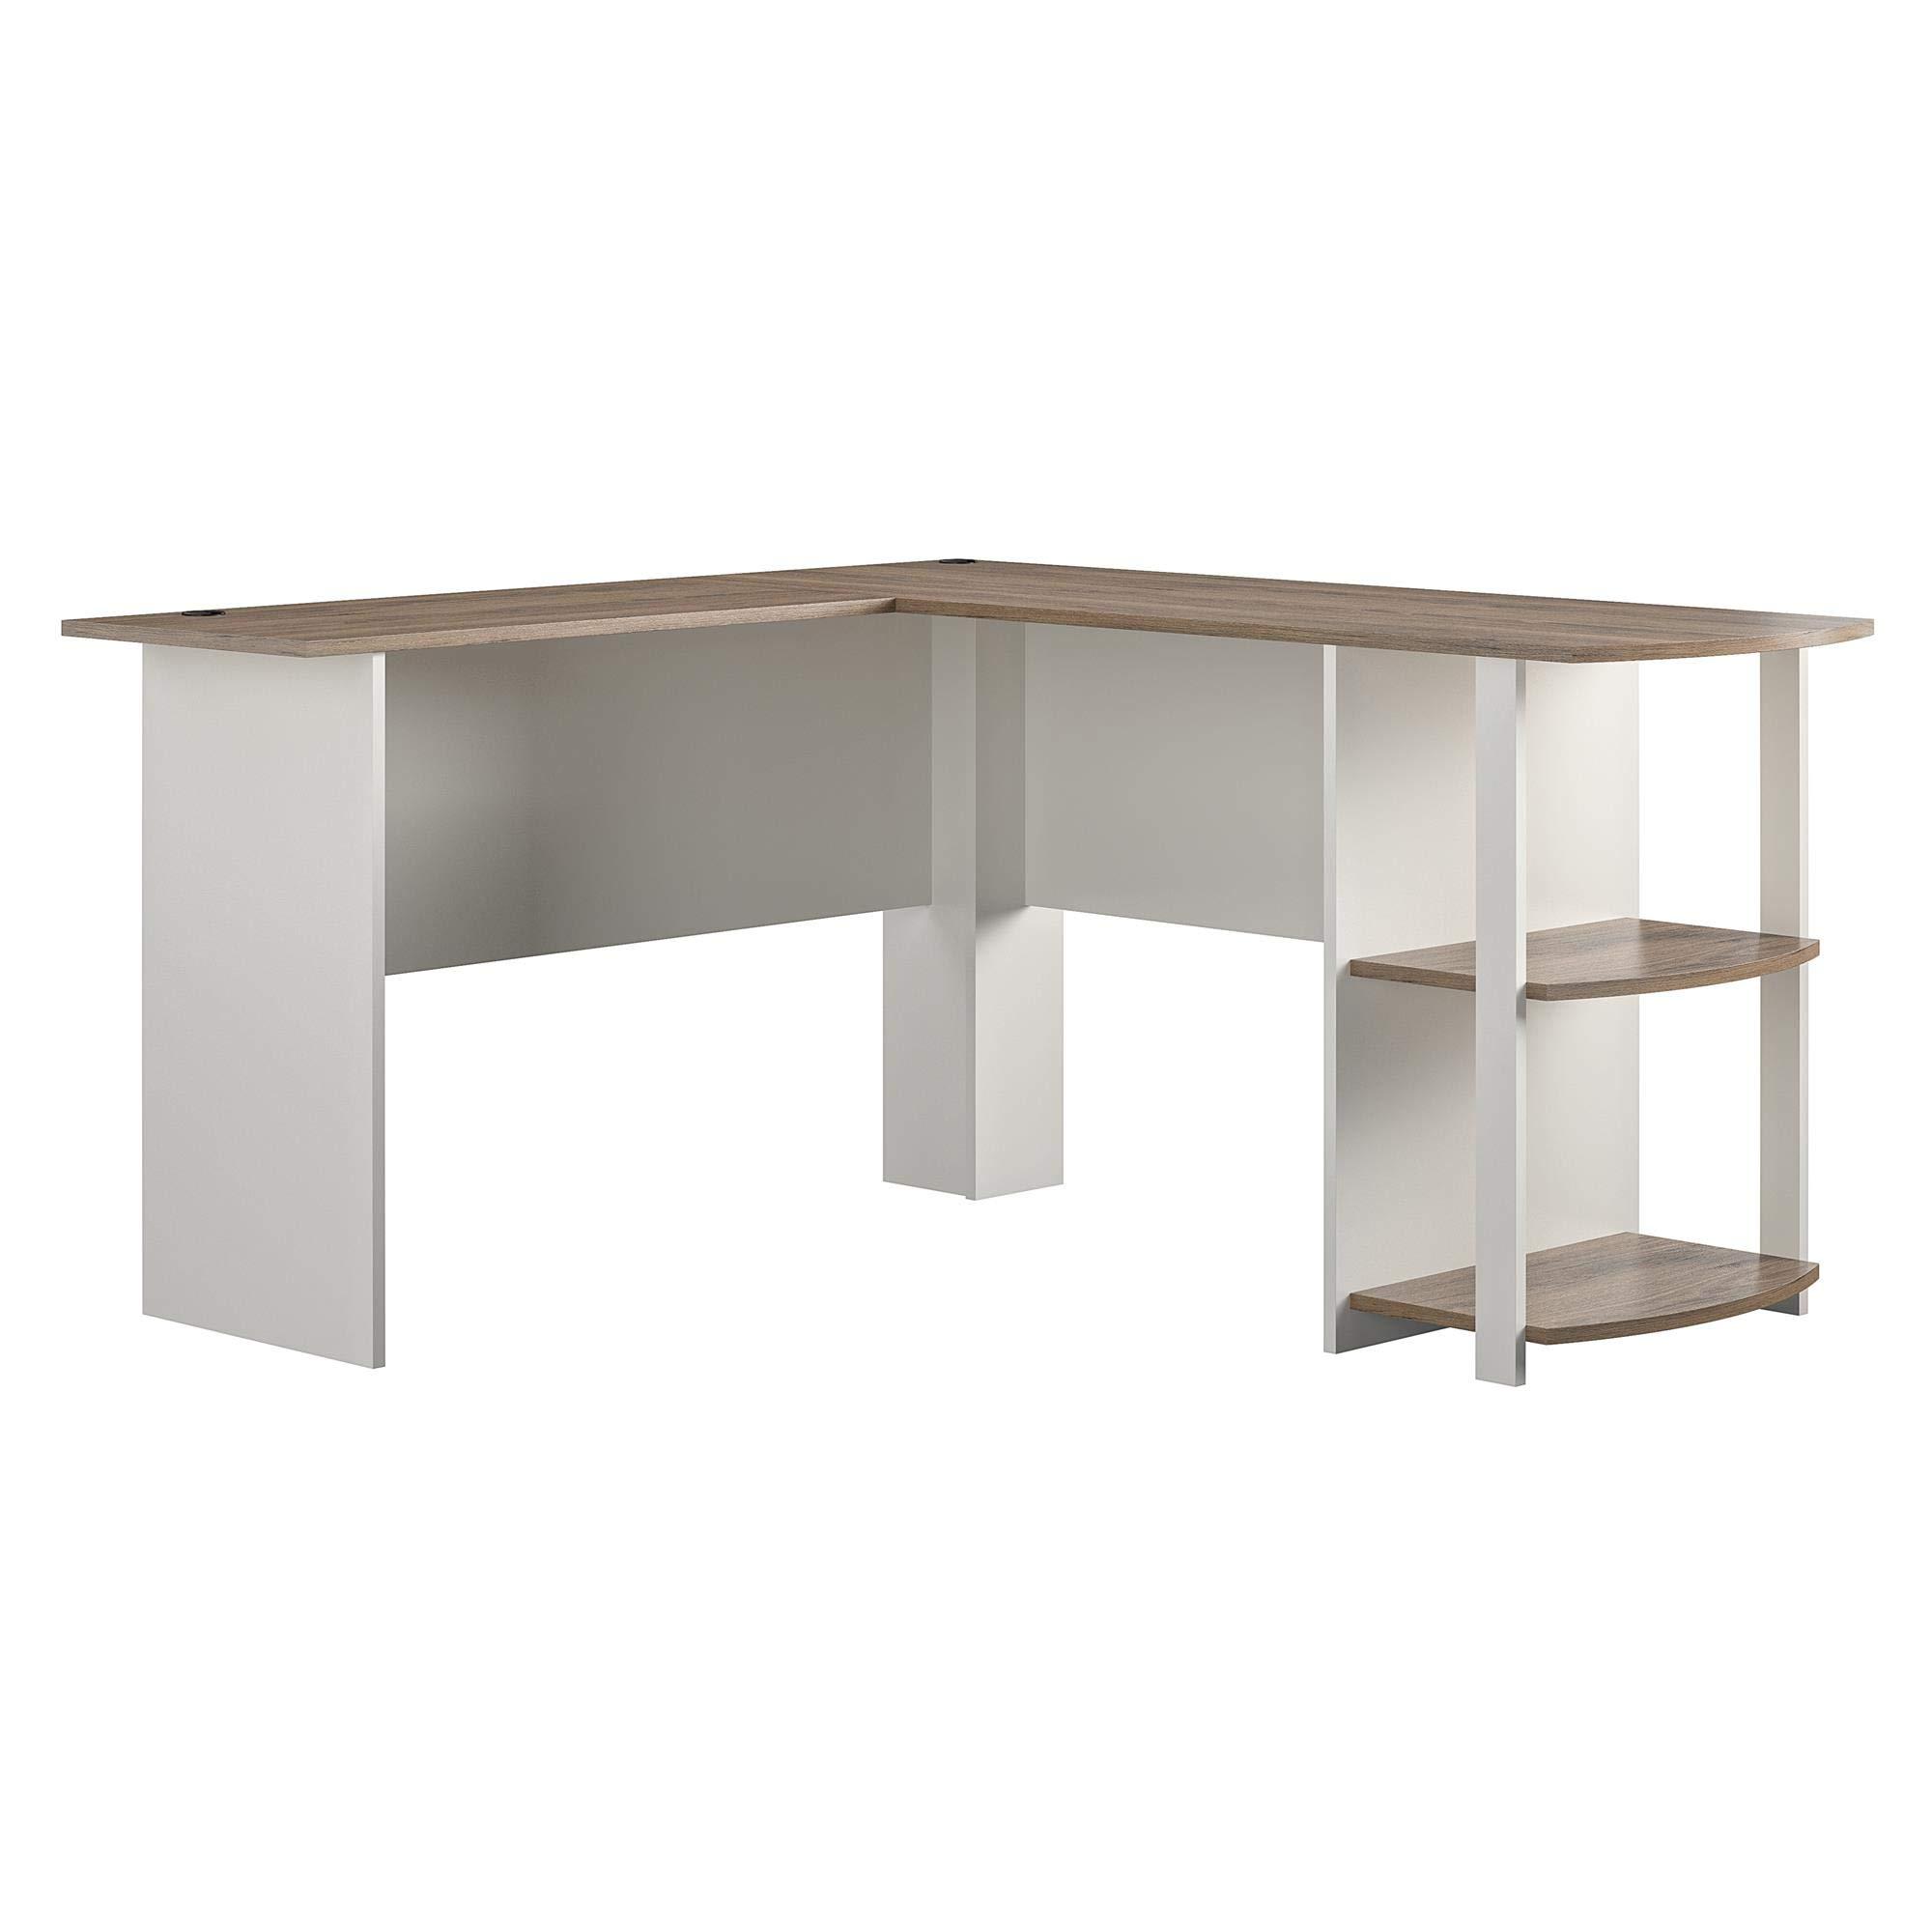 AmazonBasics Classic L-Shaped Desk with Open Bookshelves, White/Natural by AmazonBasics